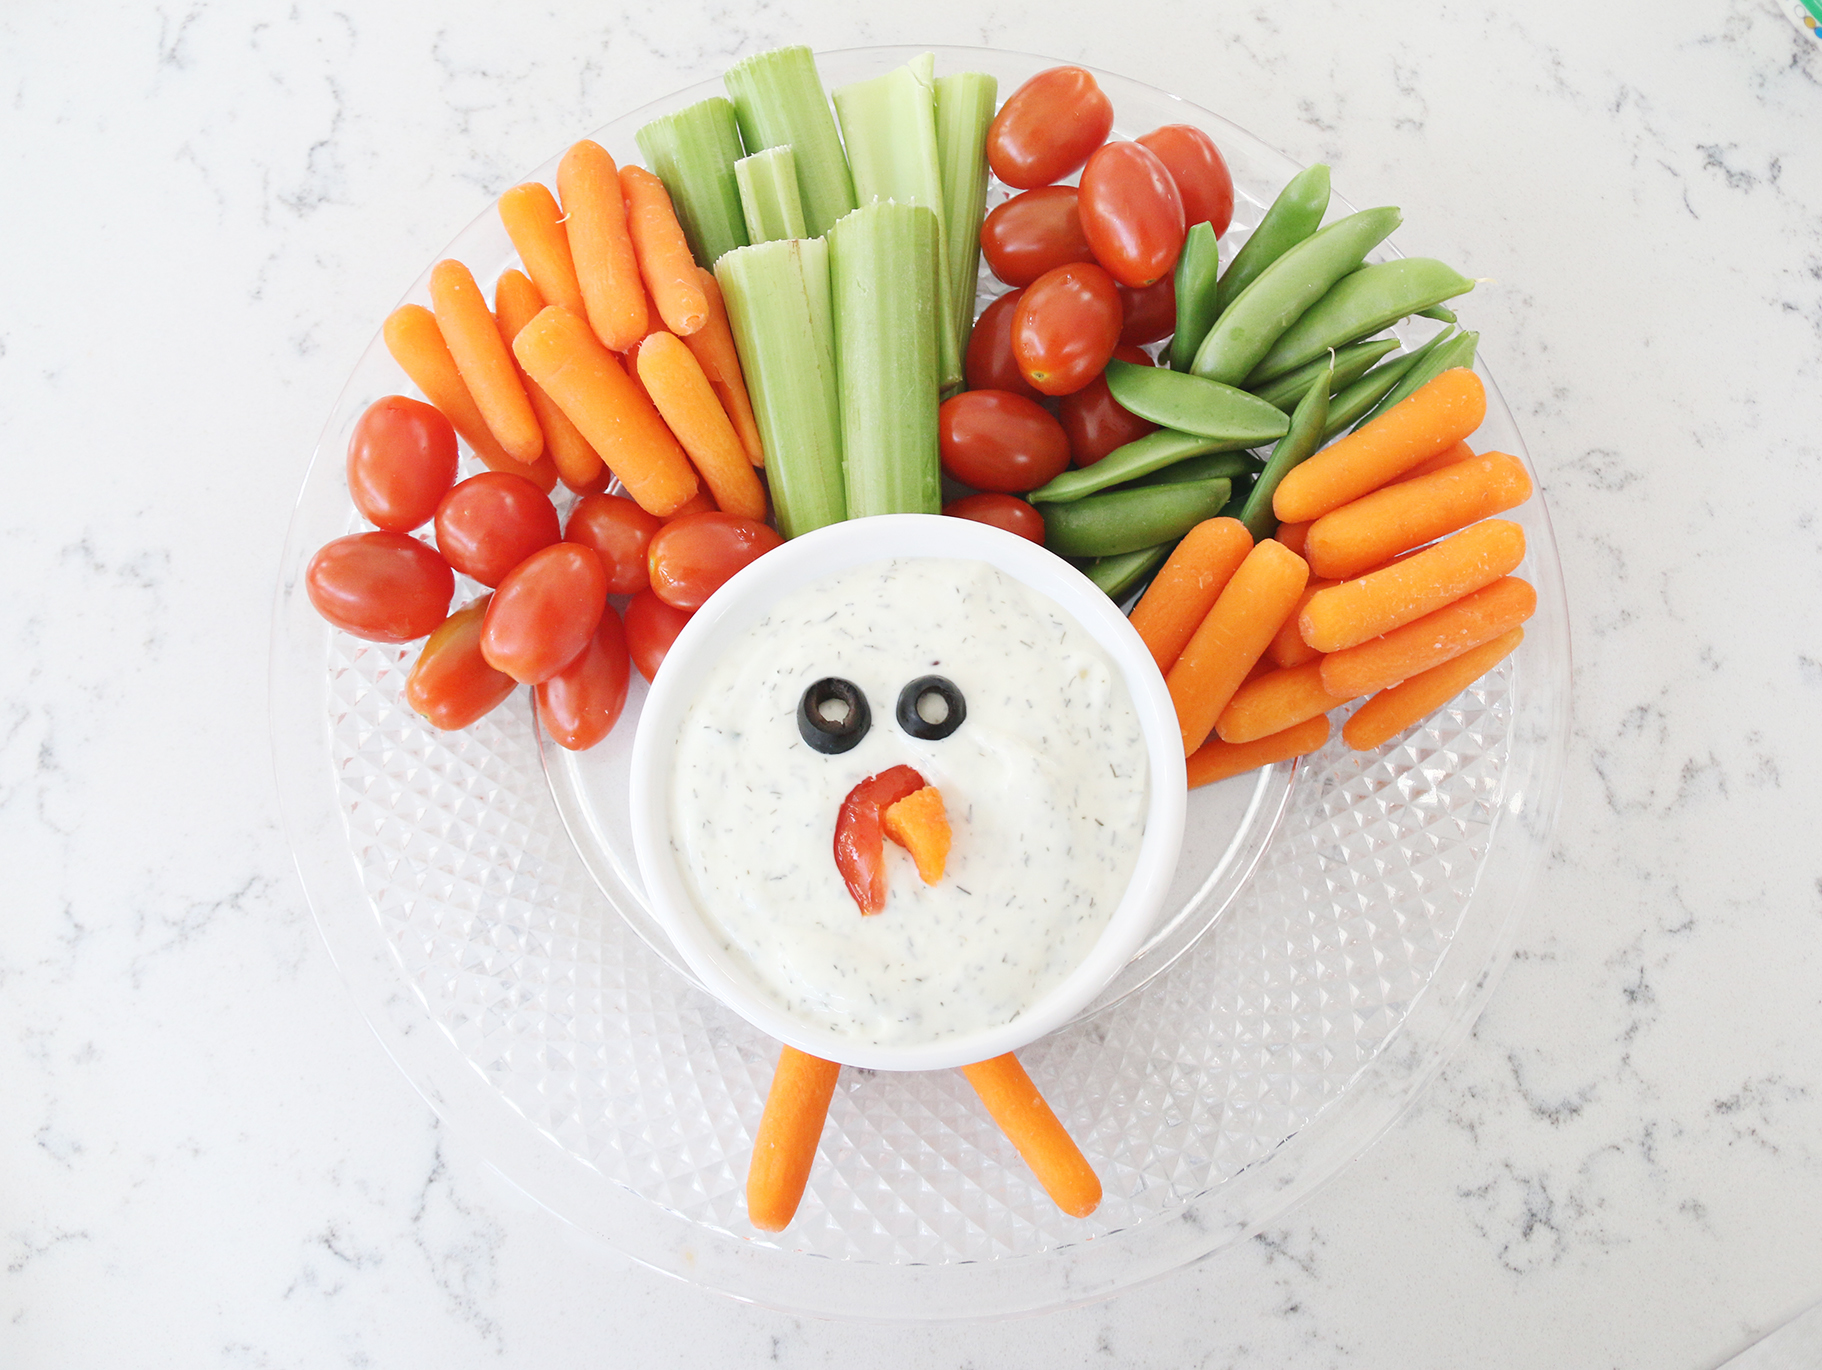 Turkey Veggie Tray With Homemade Dip Fun365